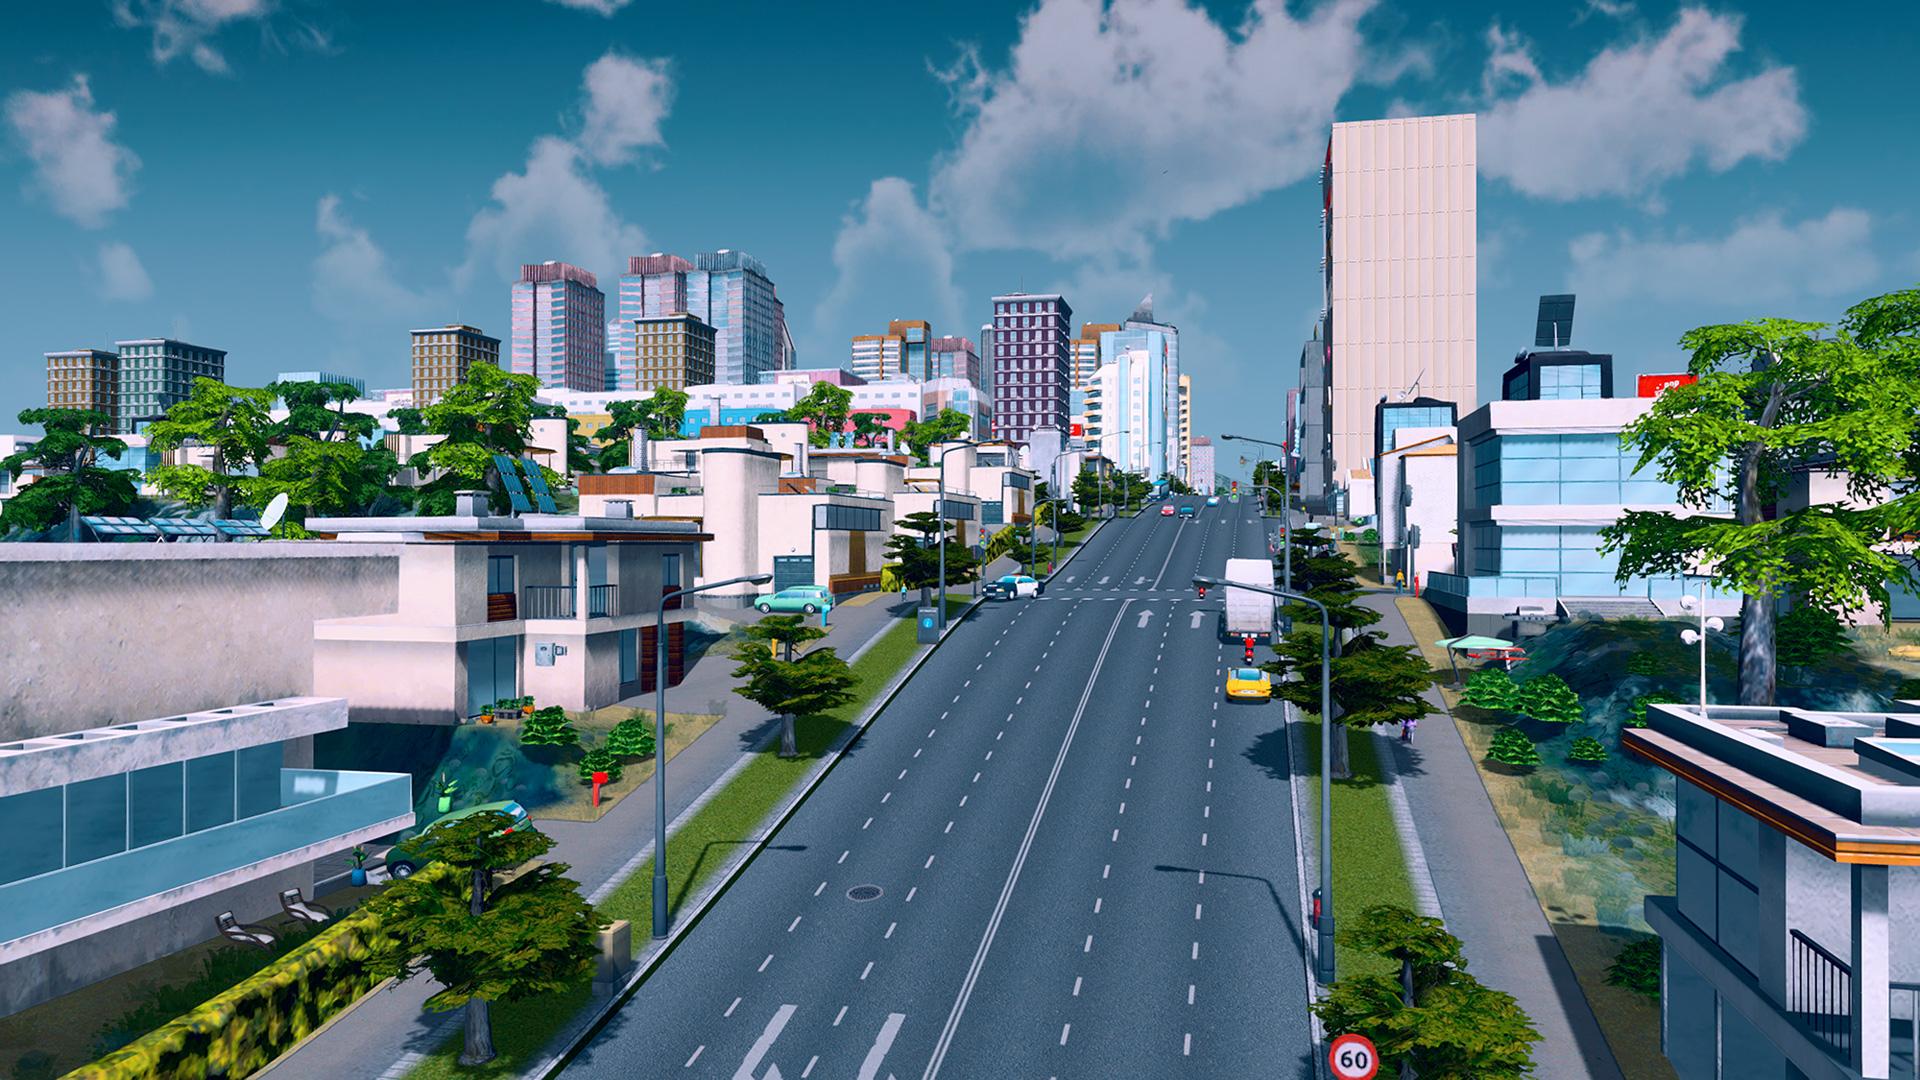 http://www.idgtv.es/archivos/201803/cities-skylines-img2.jpg